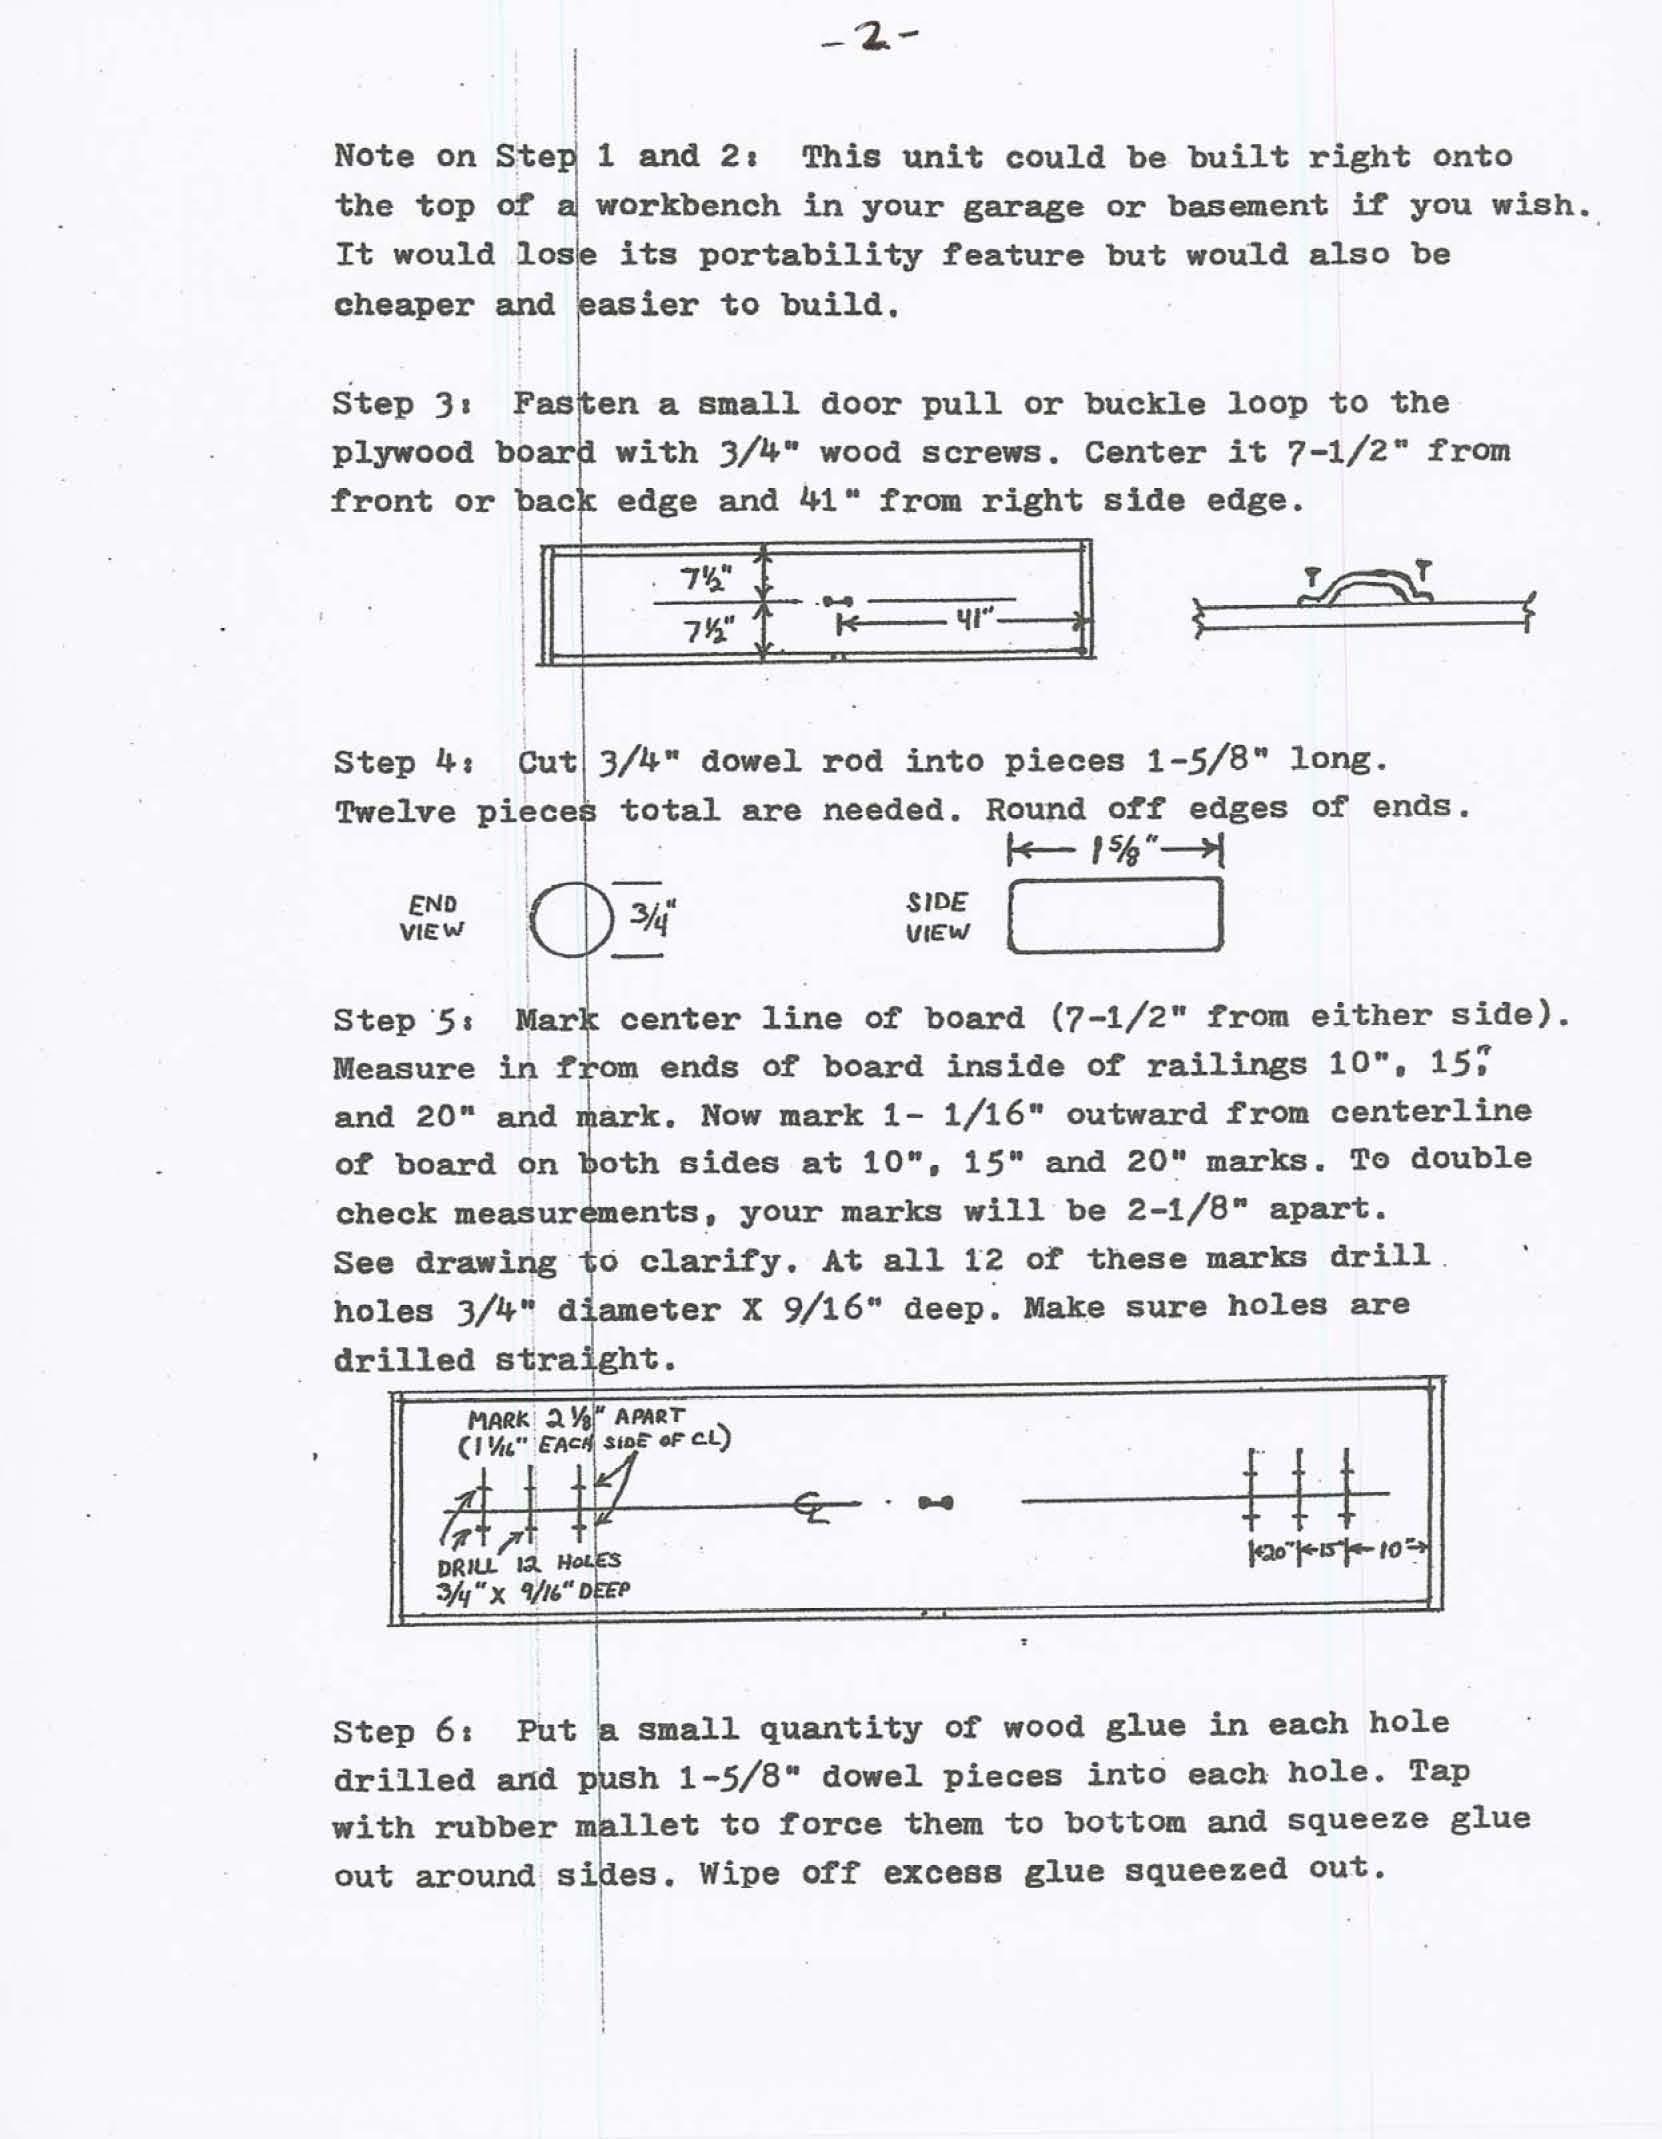 toolbenchplans-img-2.jpg